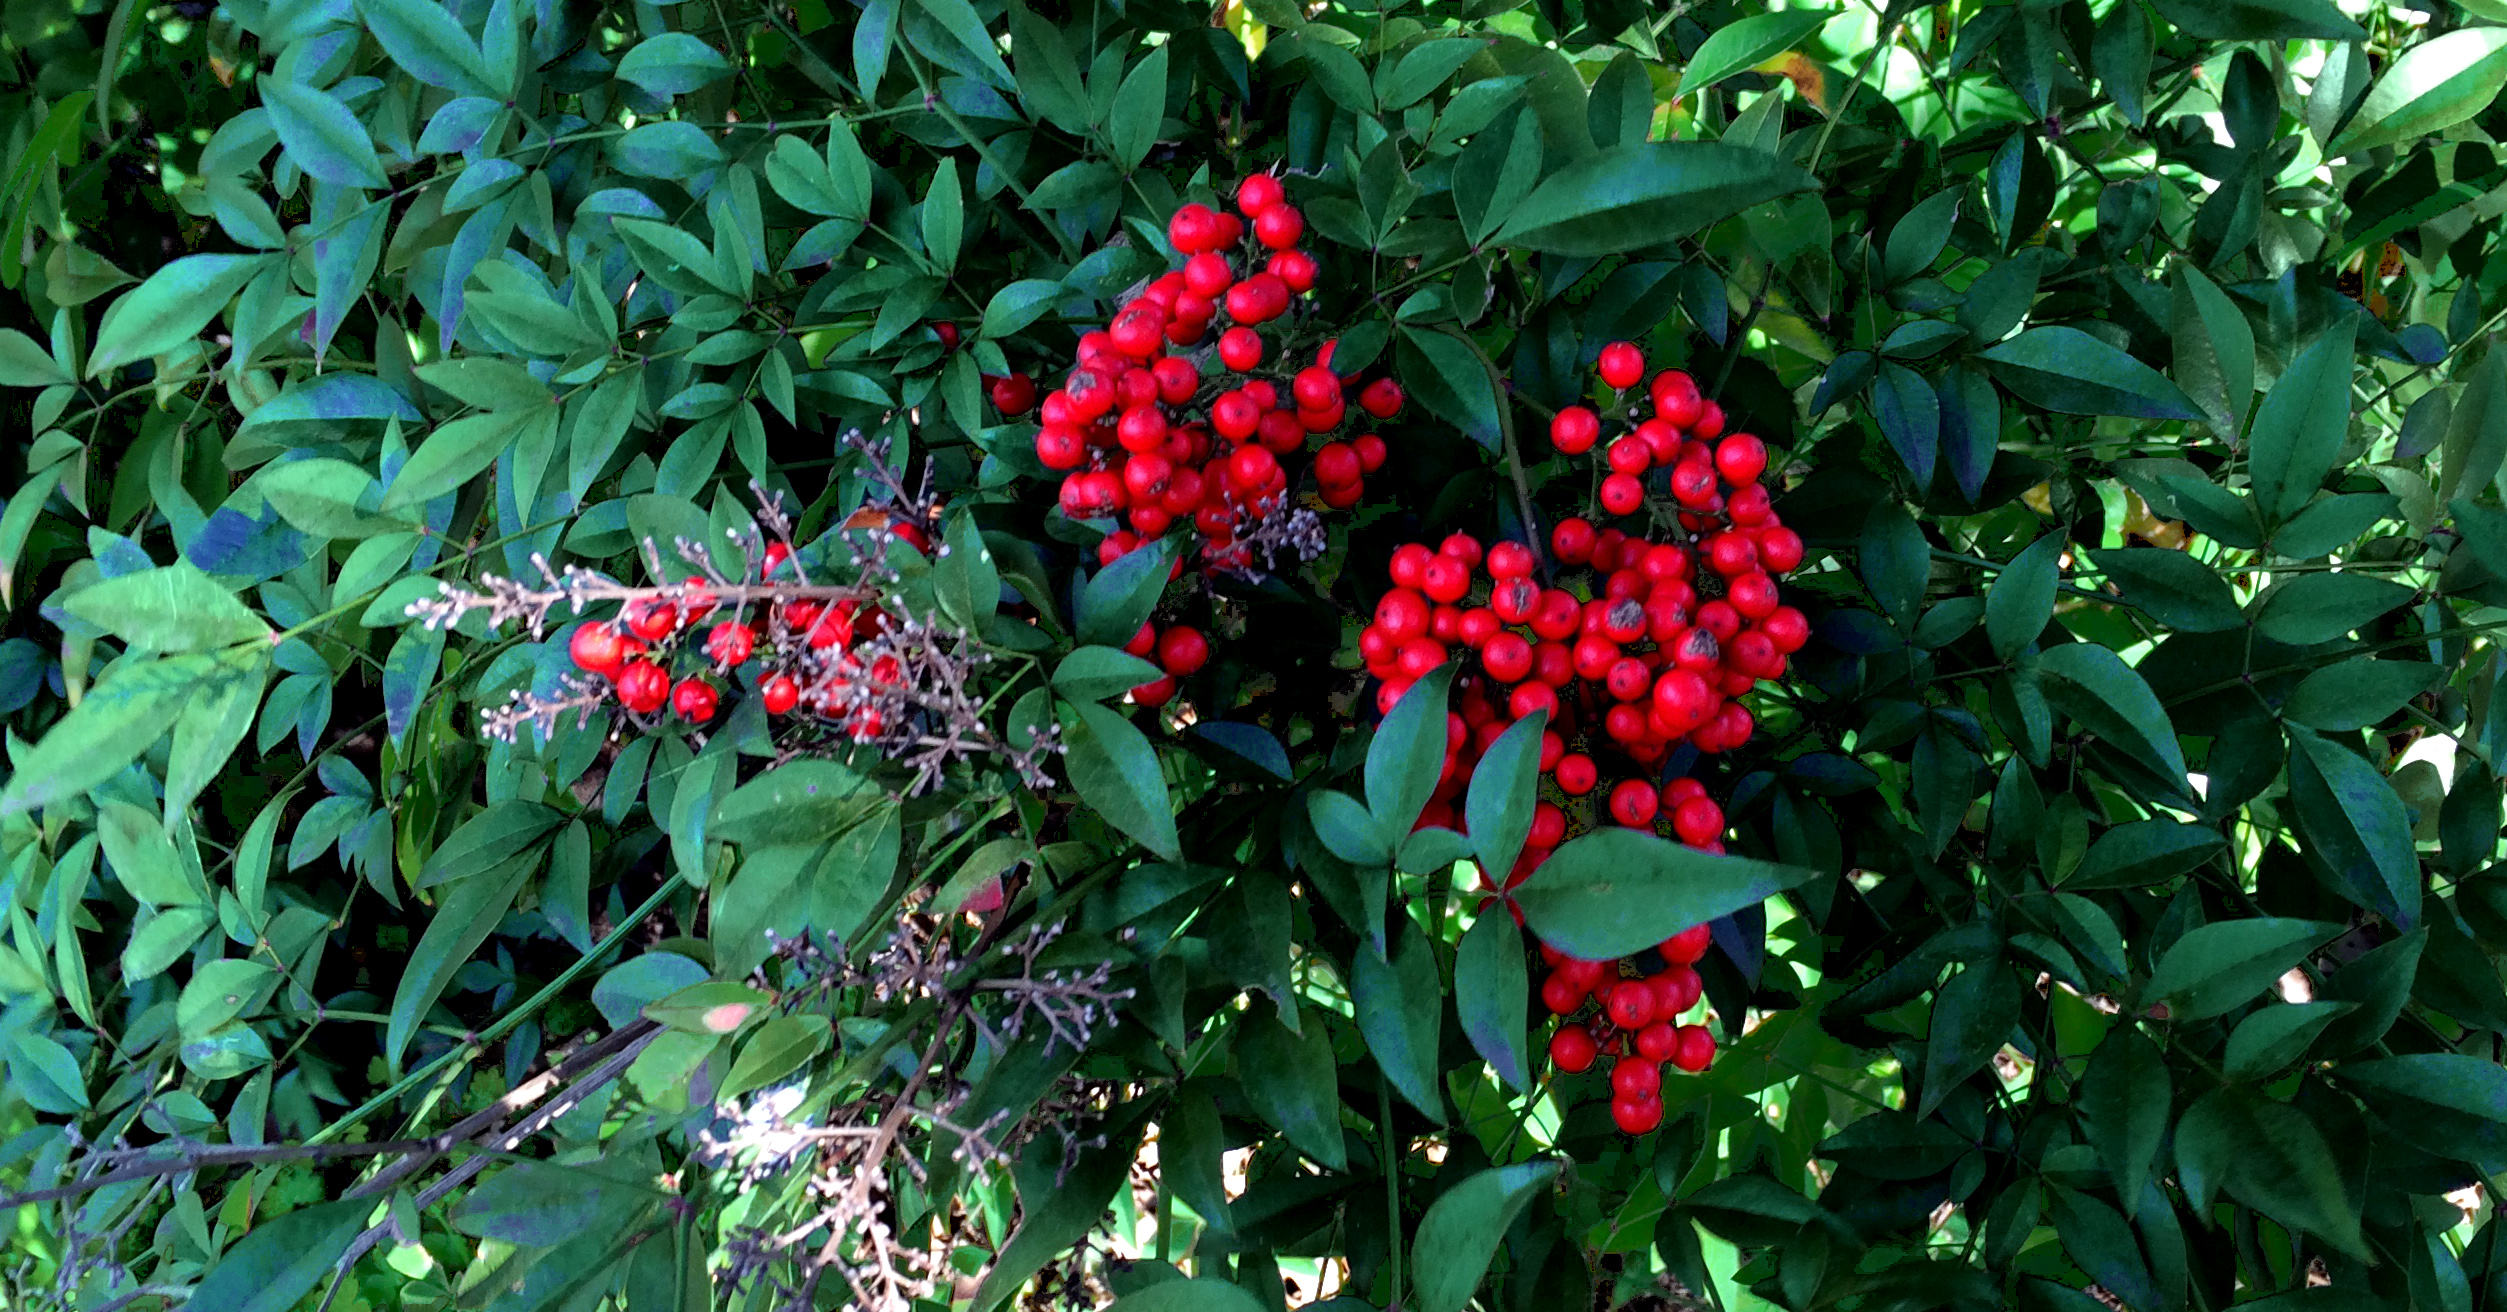 red berries 12.25.14